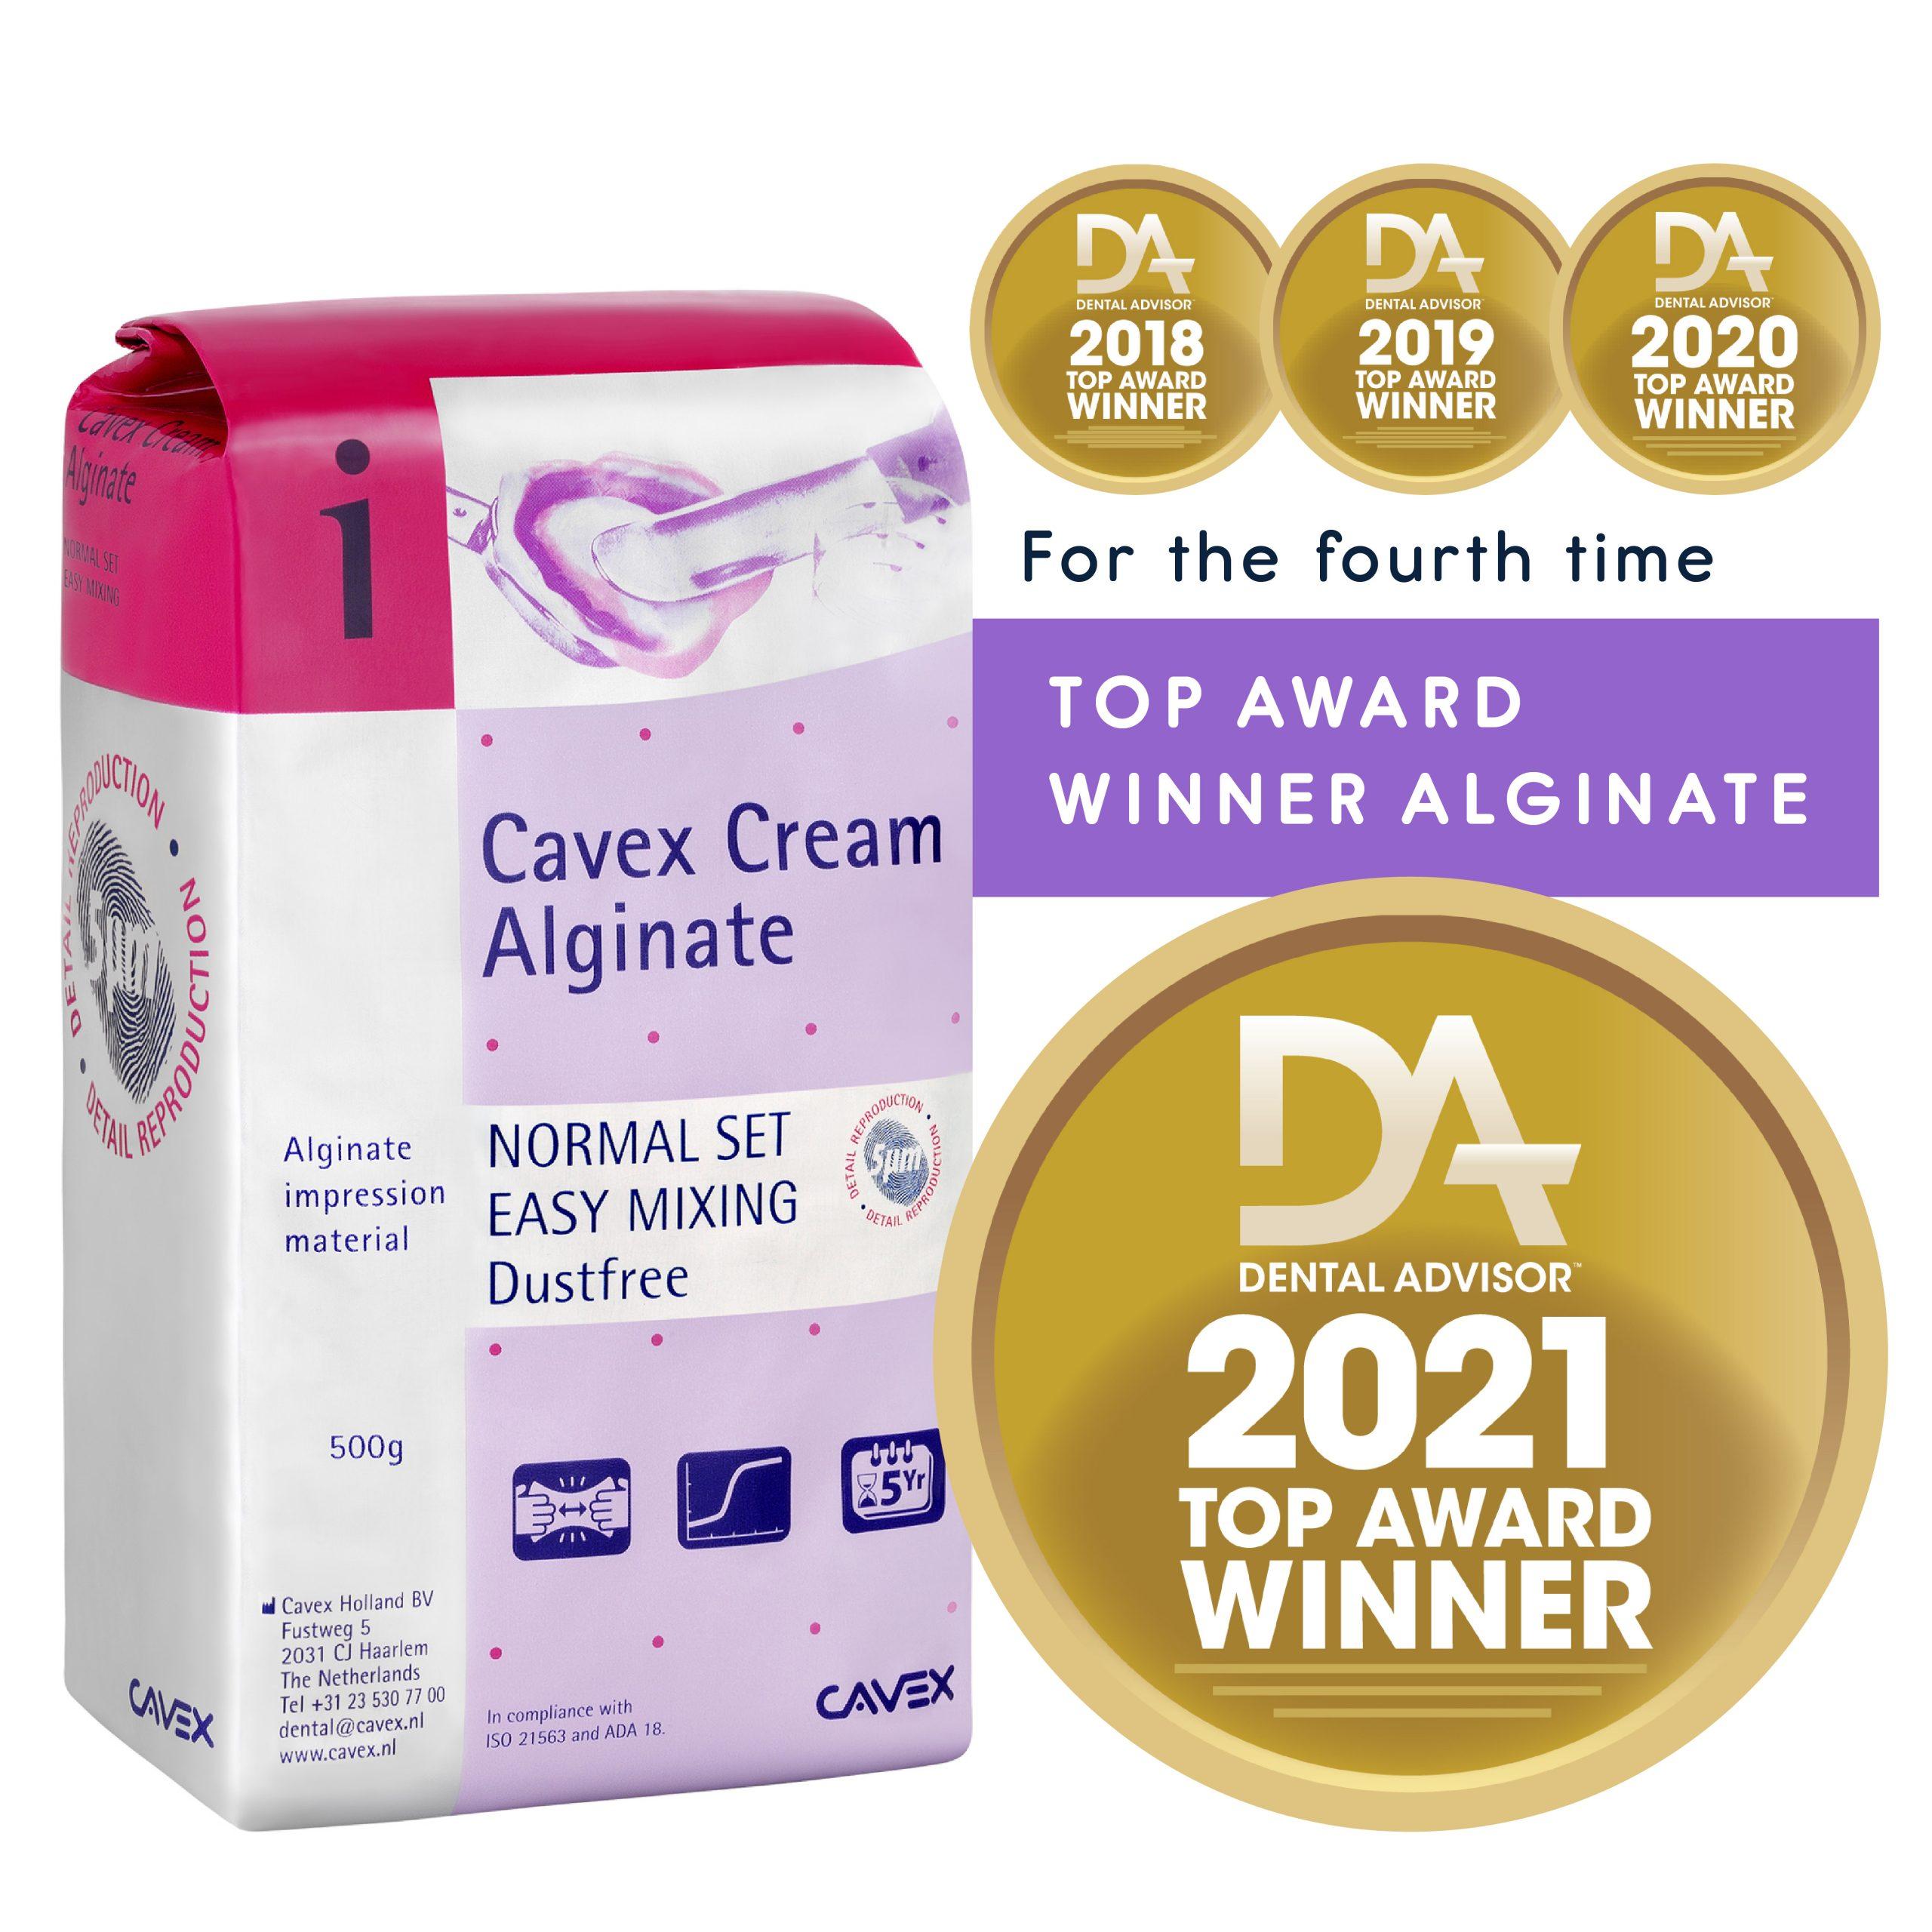 Cavex-Cream-Dental-Advisor-2018-2021-1